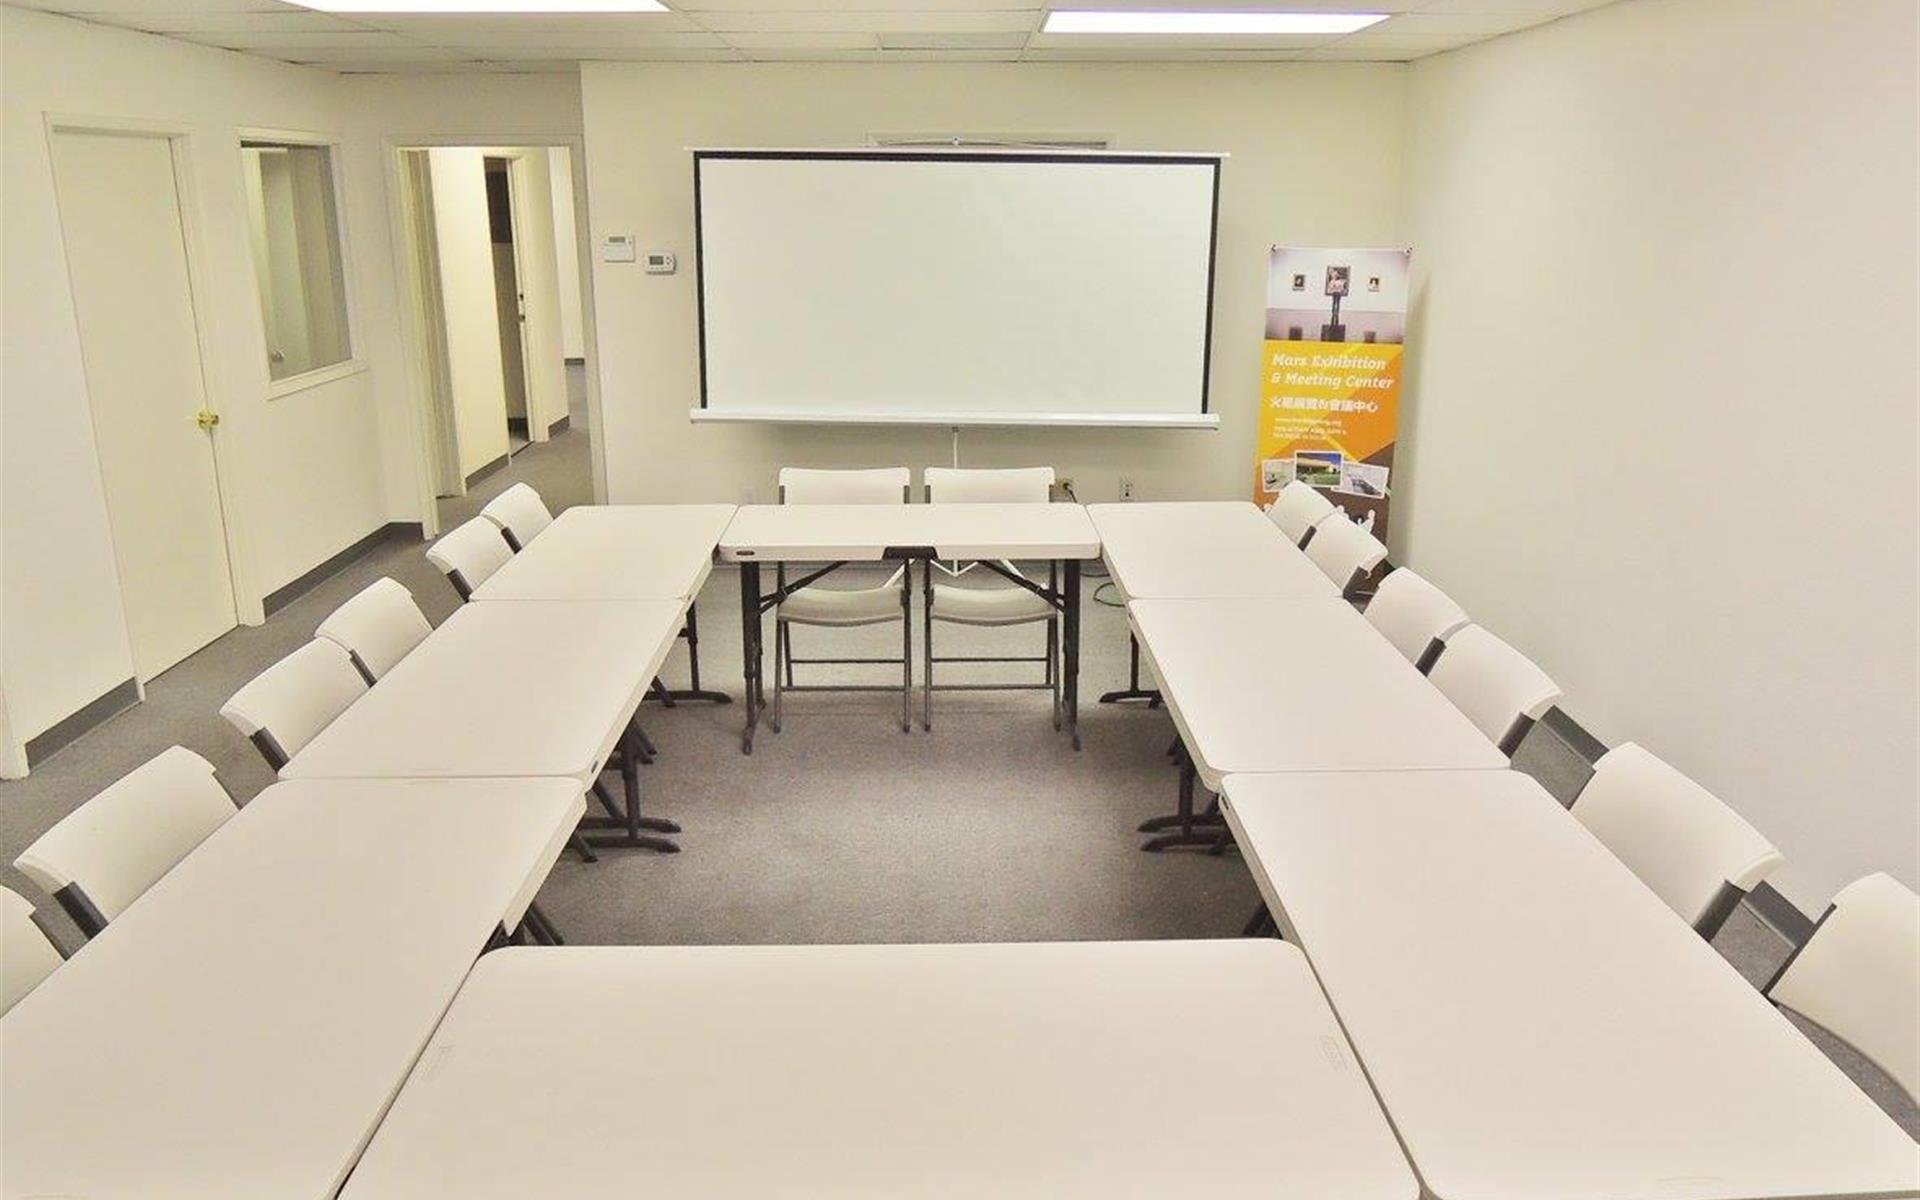 martian science - mars meeting center